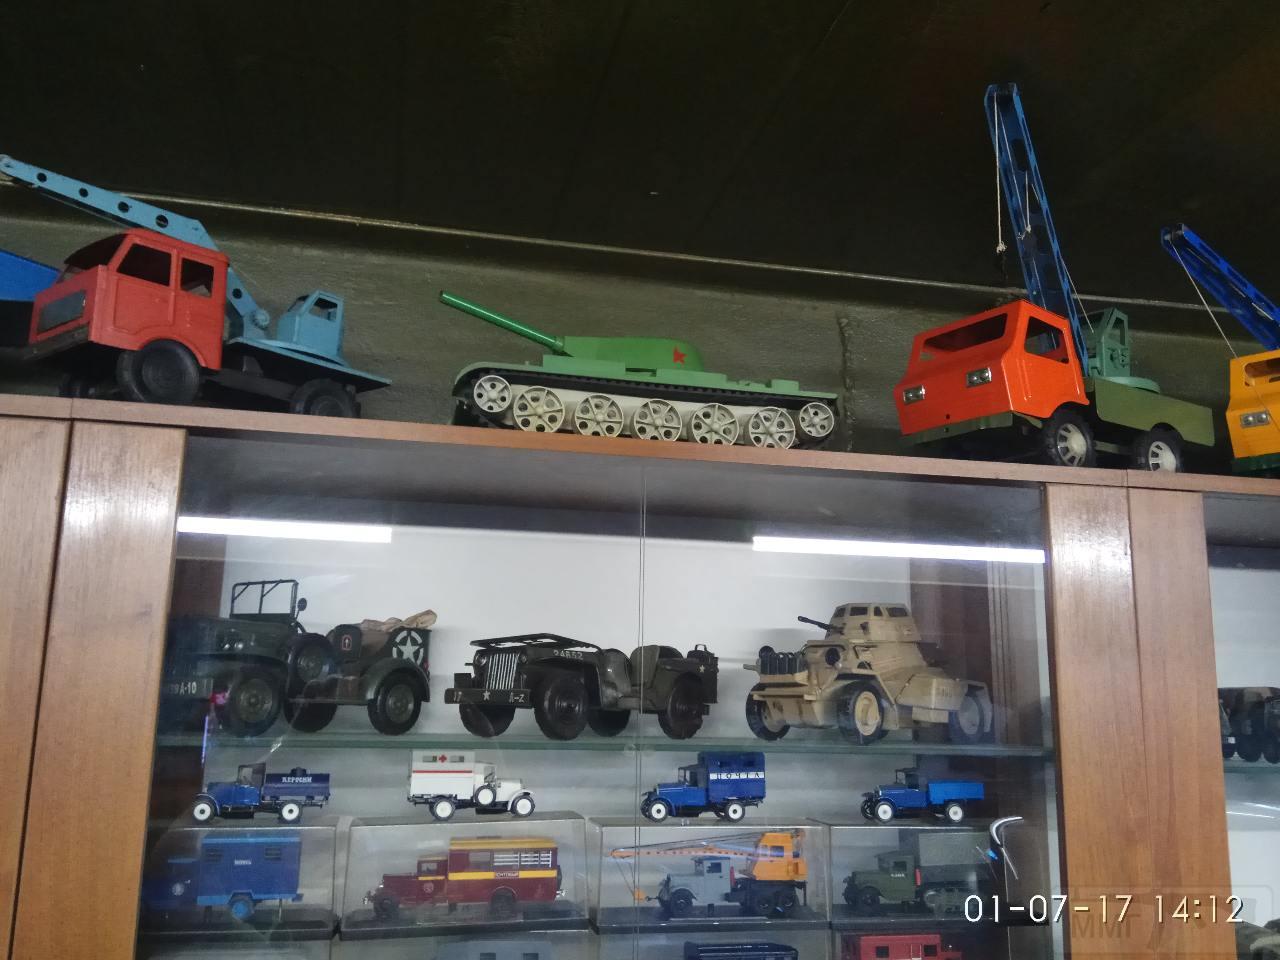 11451 - Музей техники Фаэтон в г. Запорожье